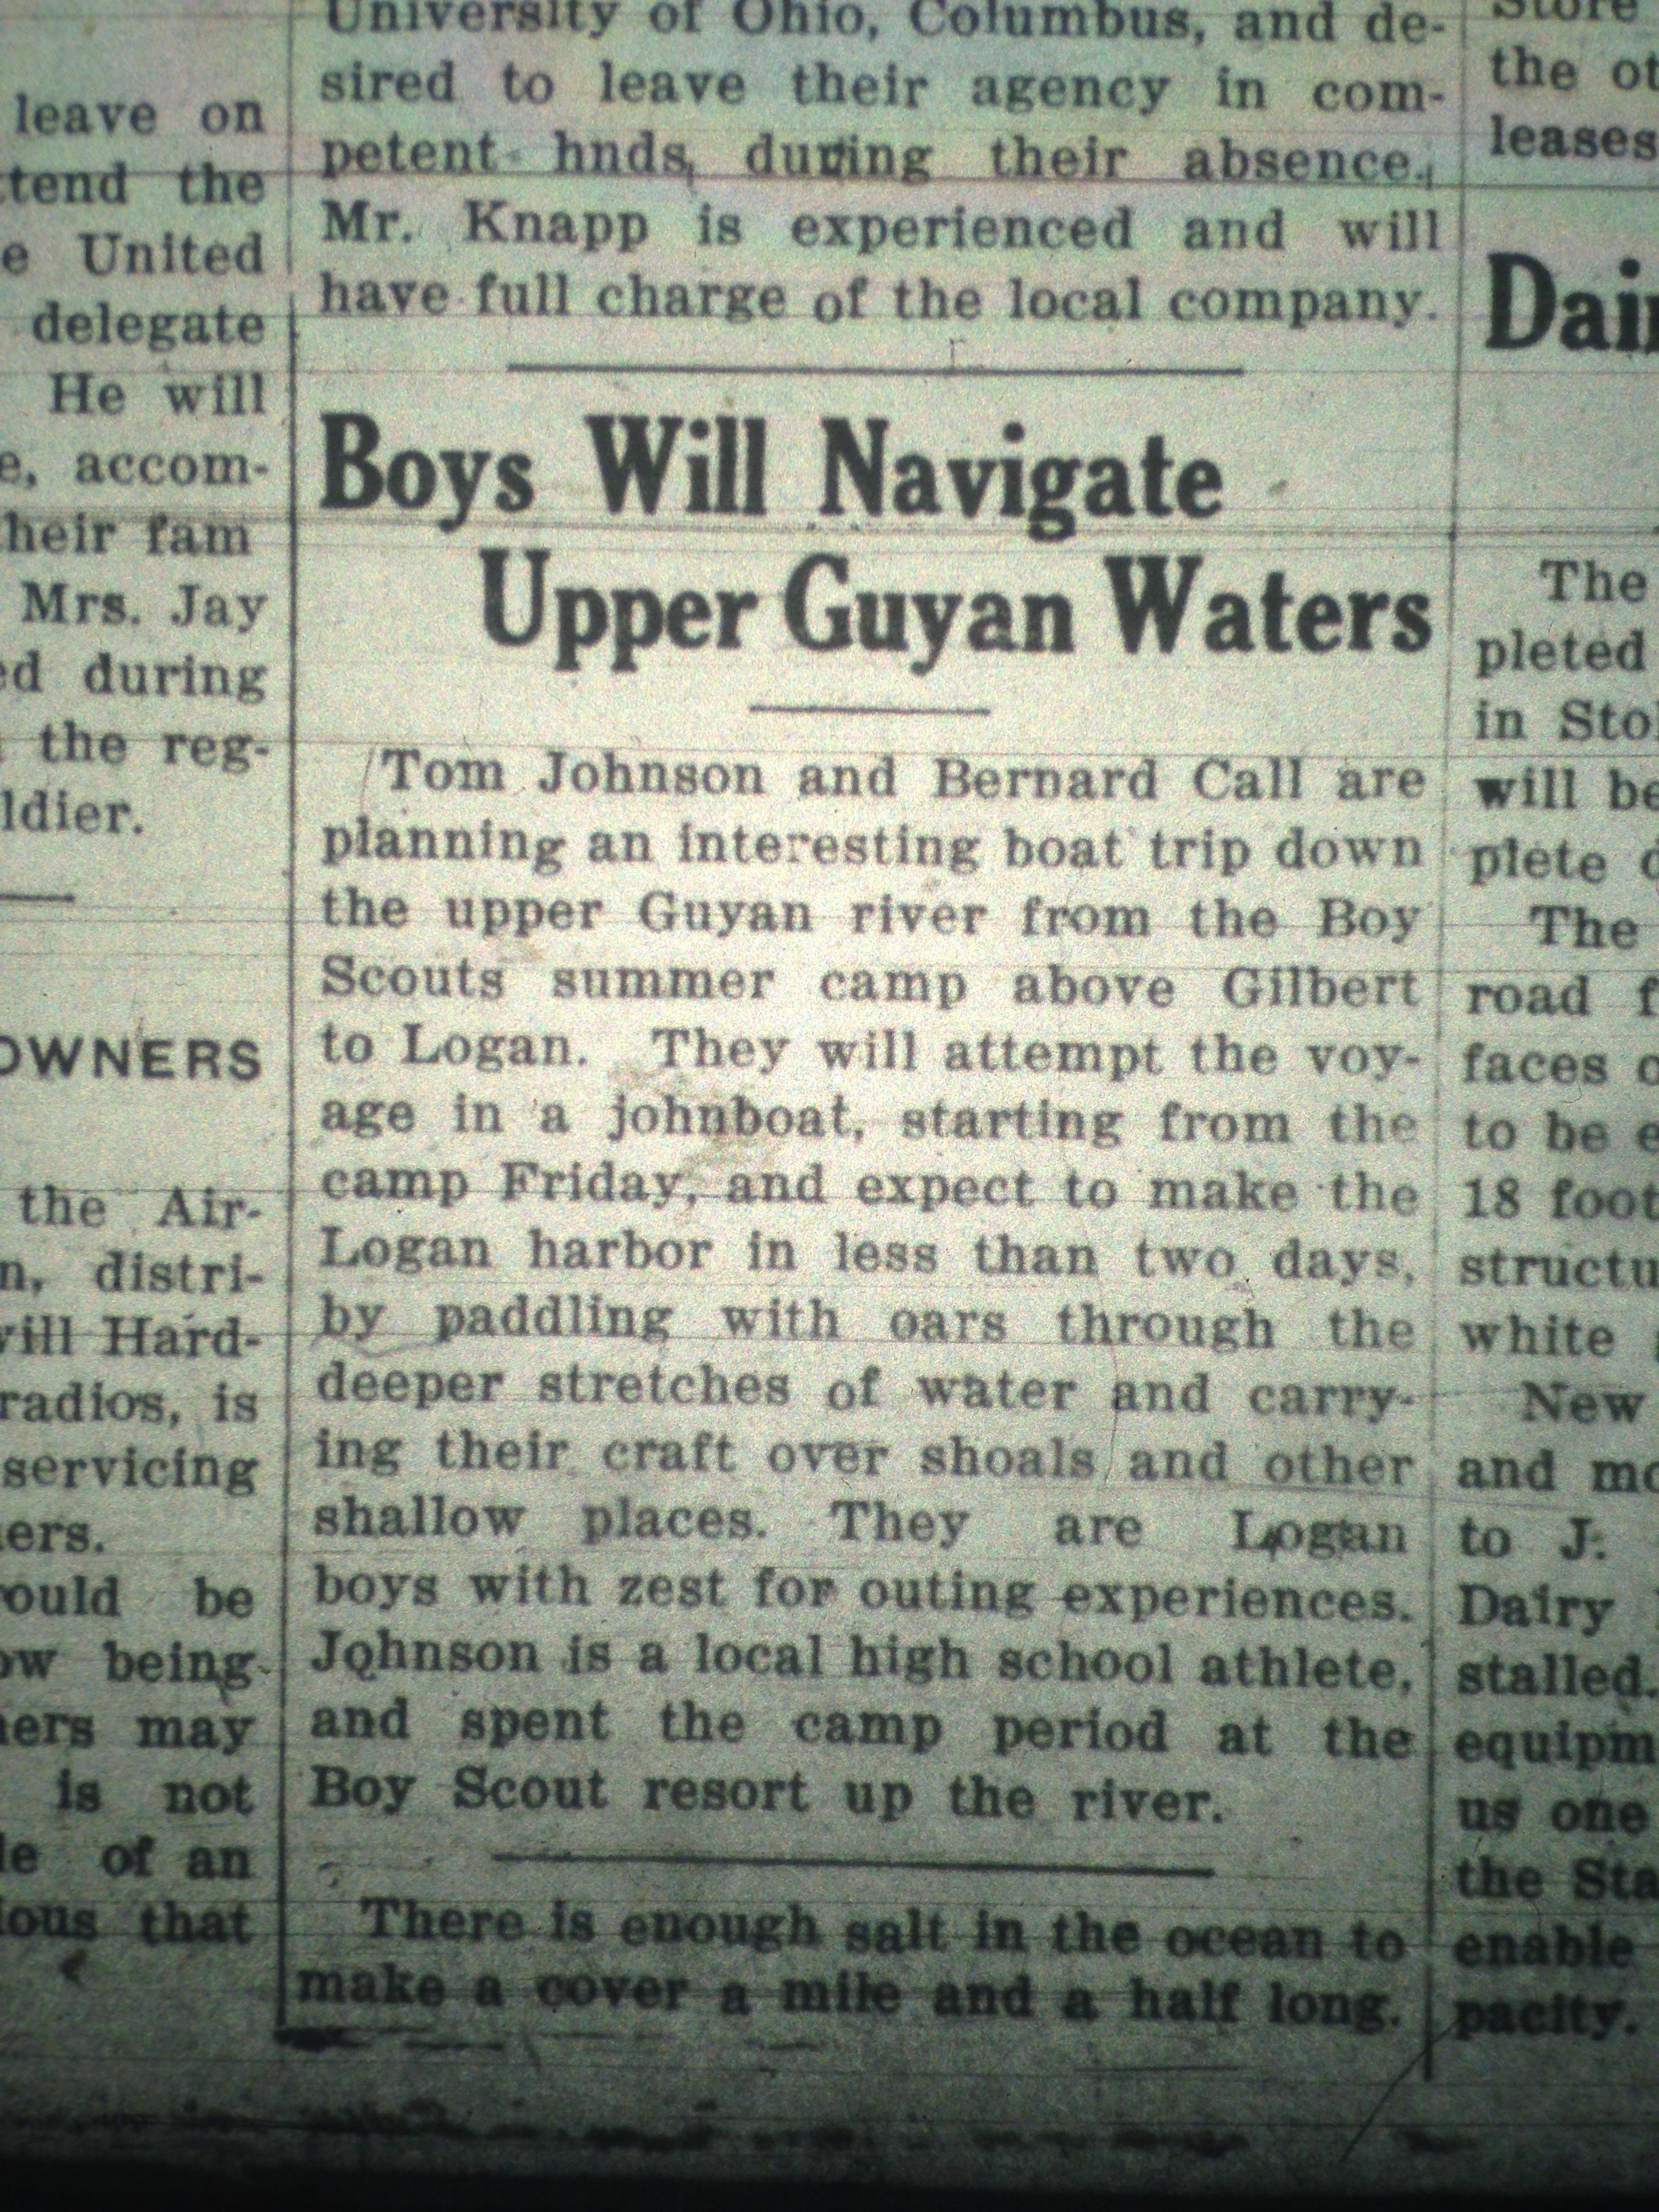 Guyan River Navigation LB 08.23.1927.JPG